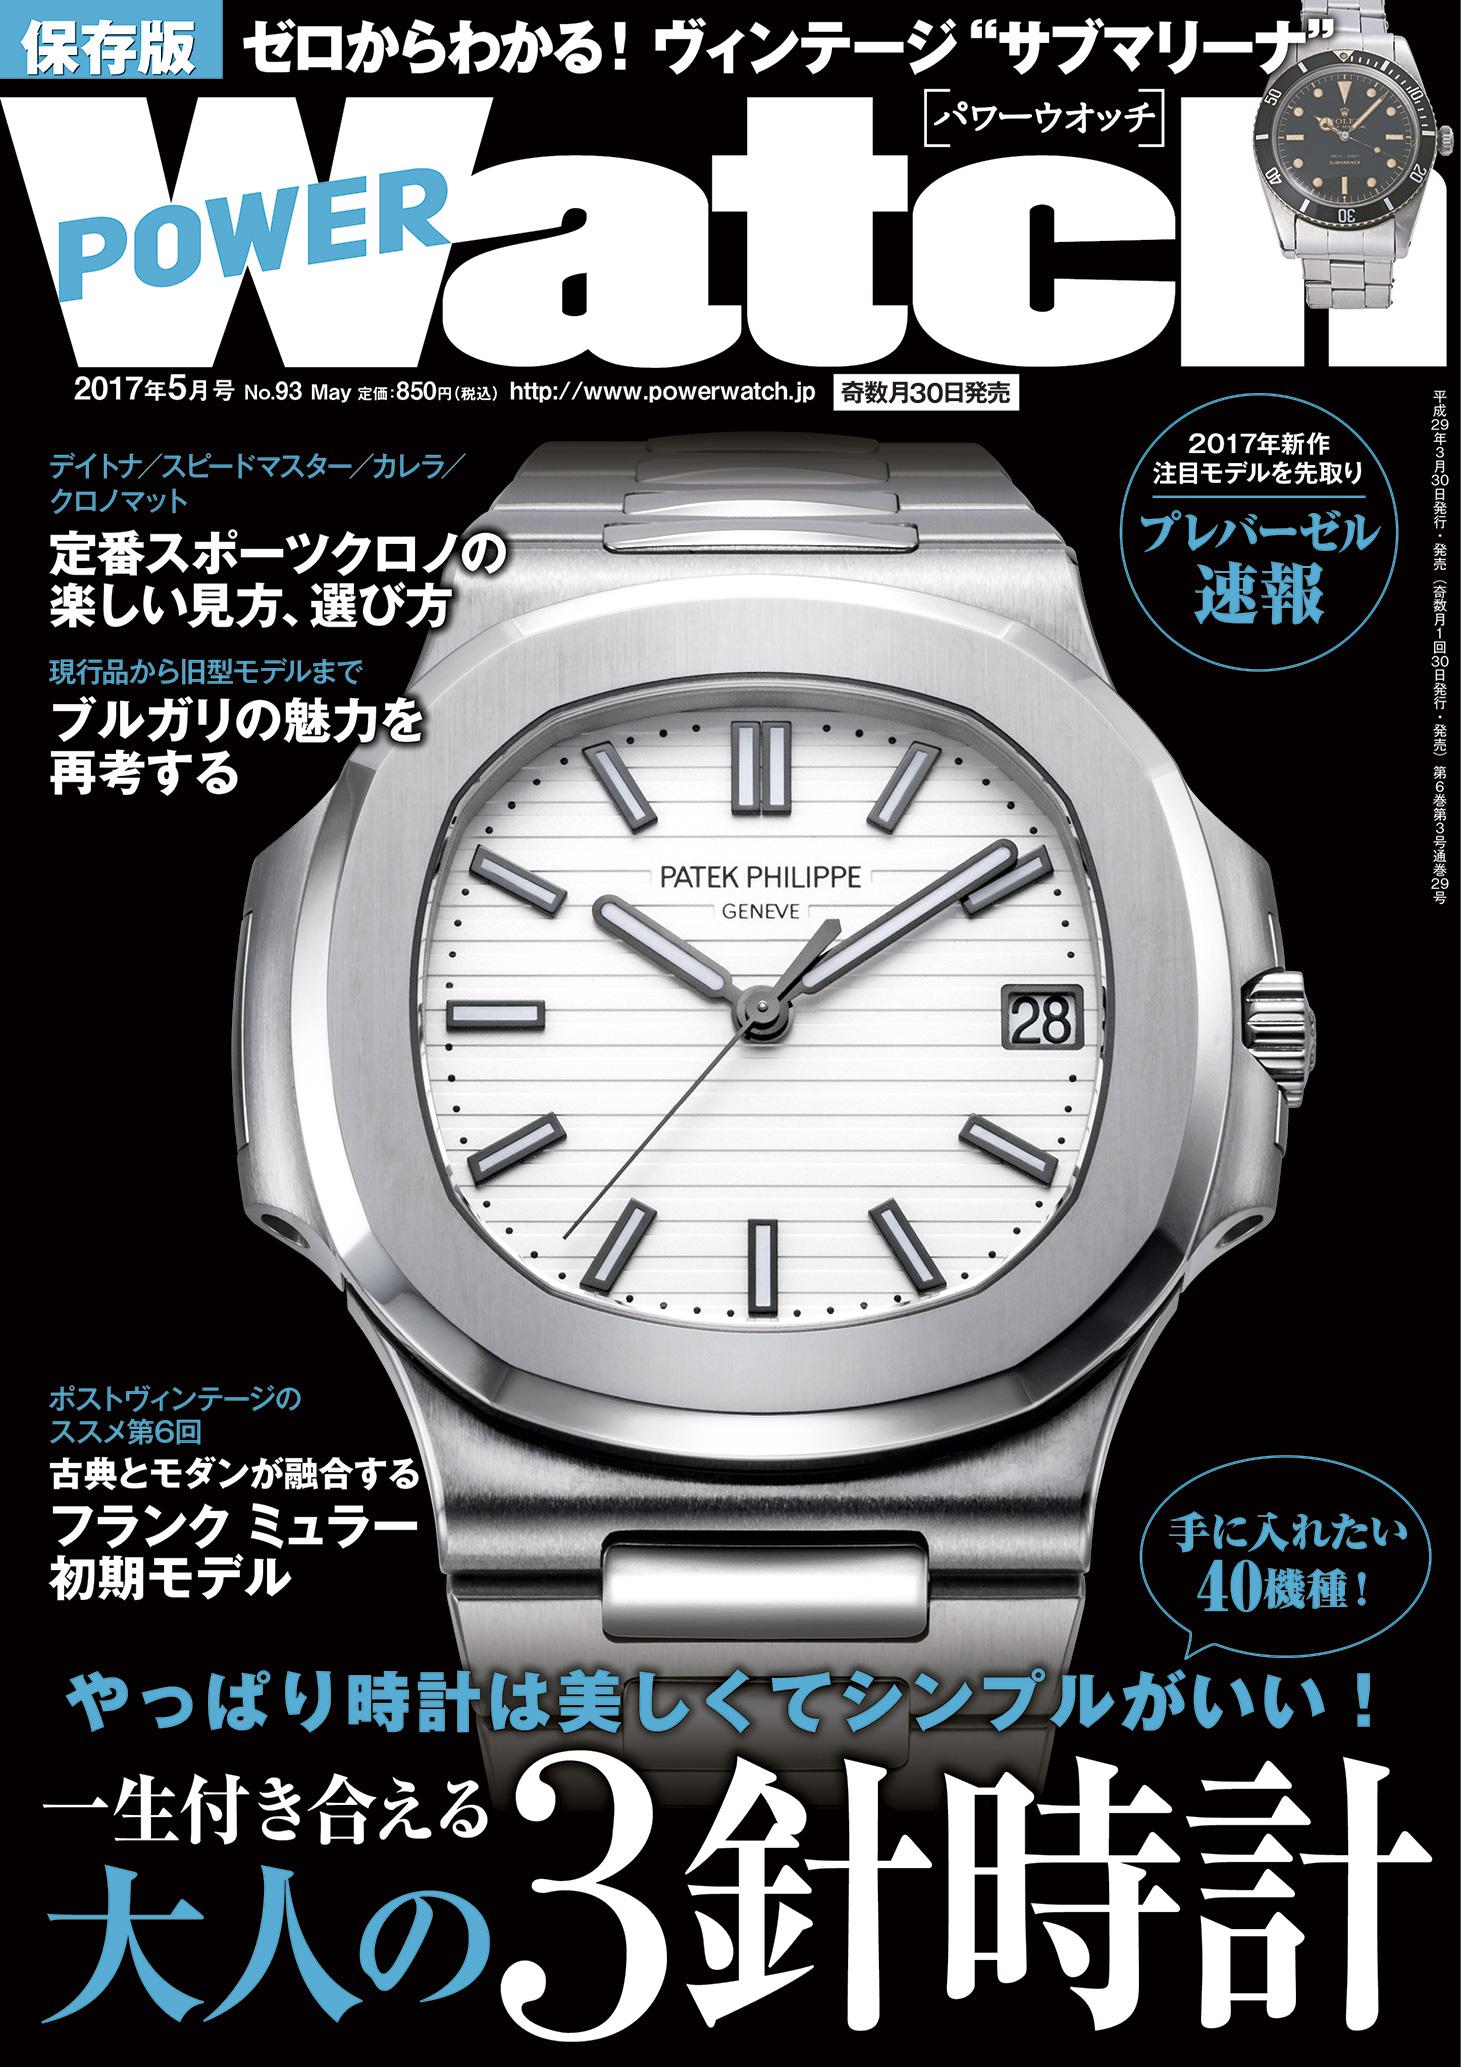 C's-Factory|書籍|PowerWATCH 5月号